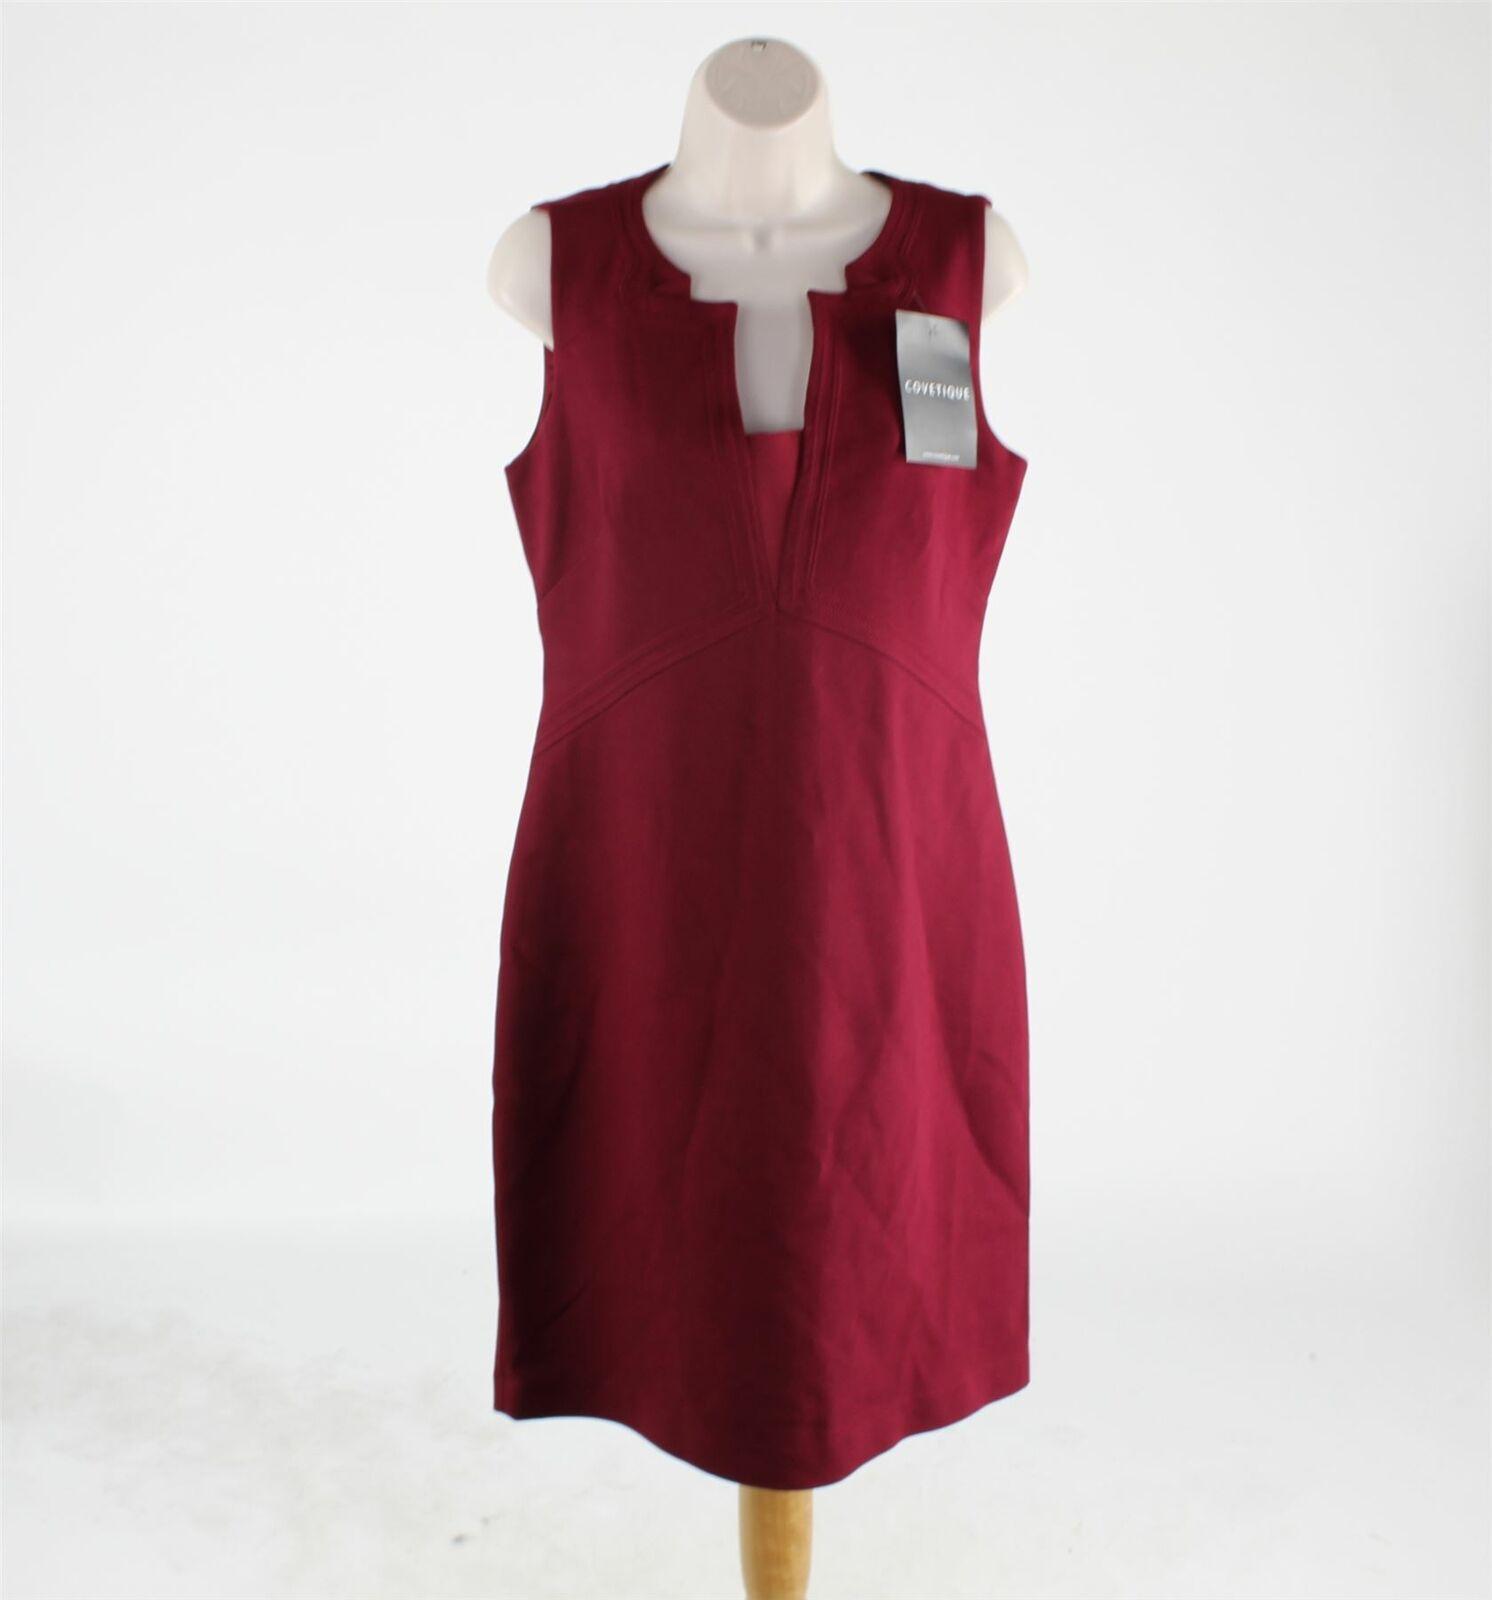 ELIE TAHARI rot Dress, UK 12 US 8 EU 40